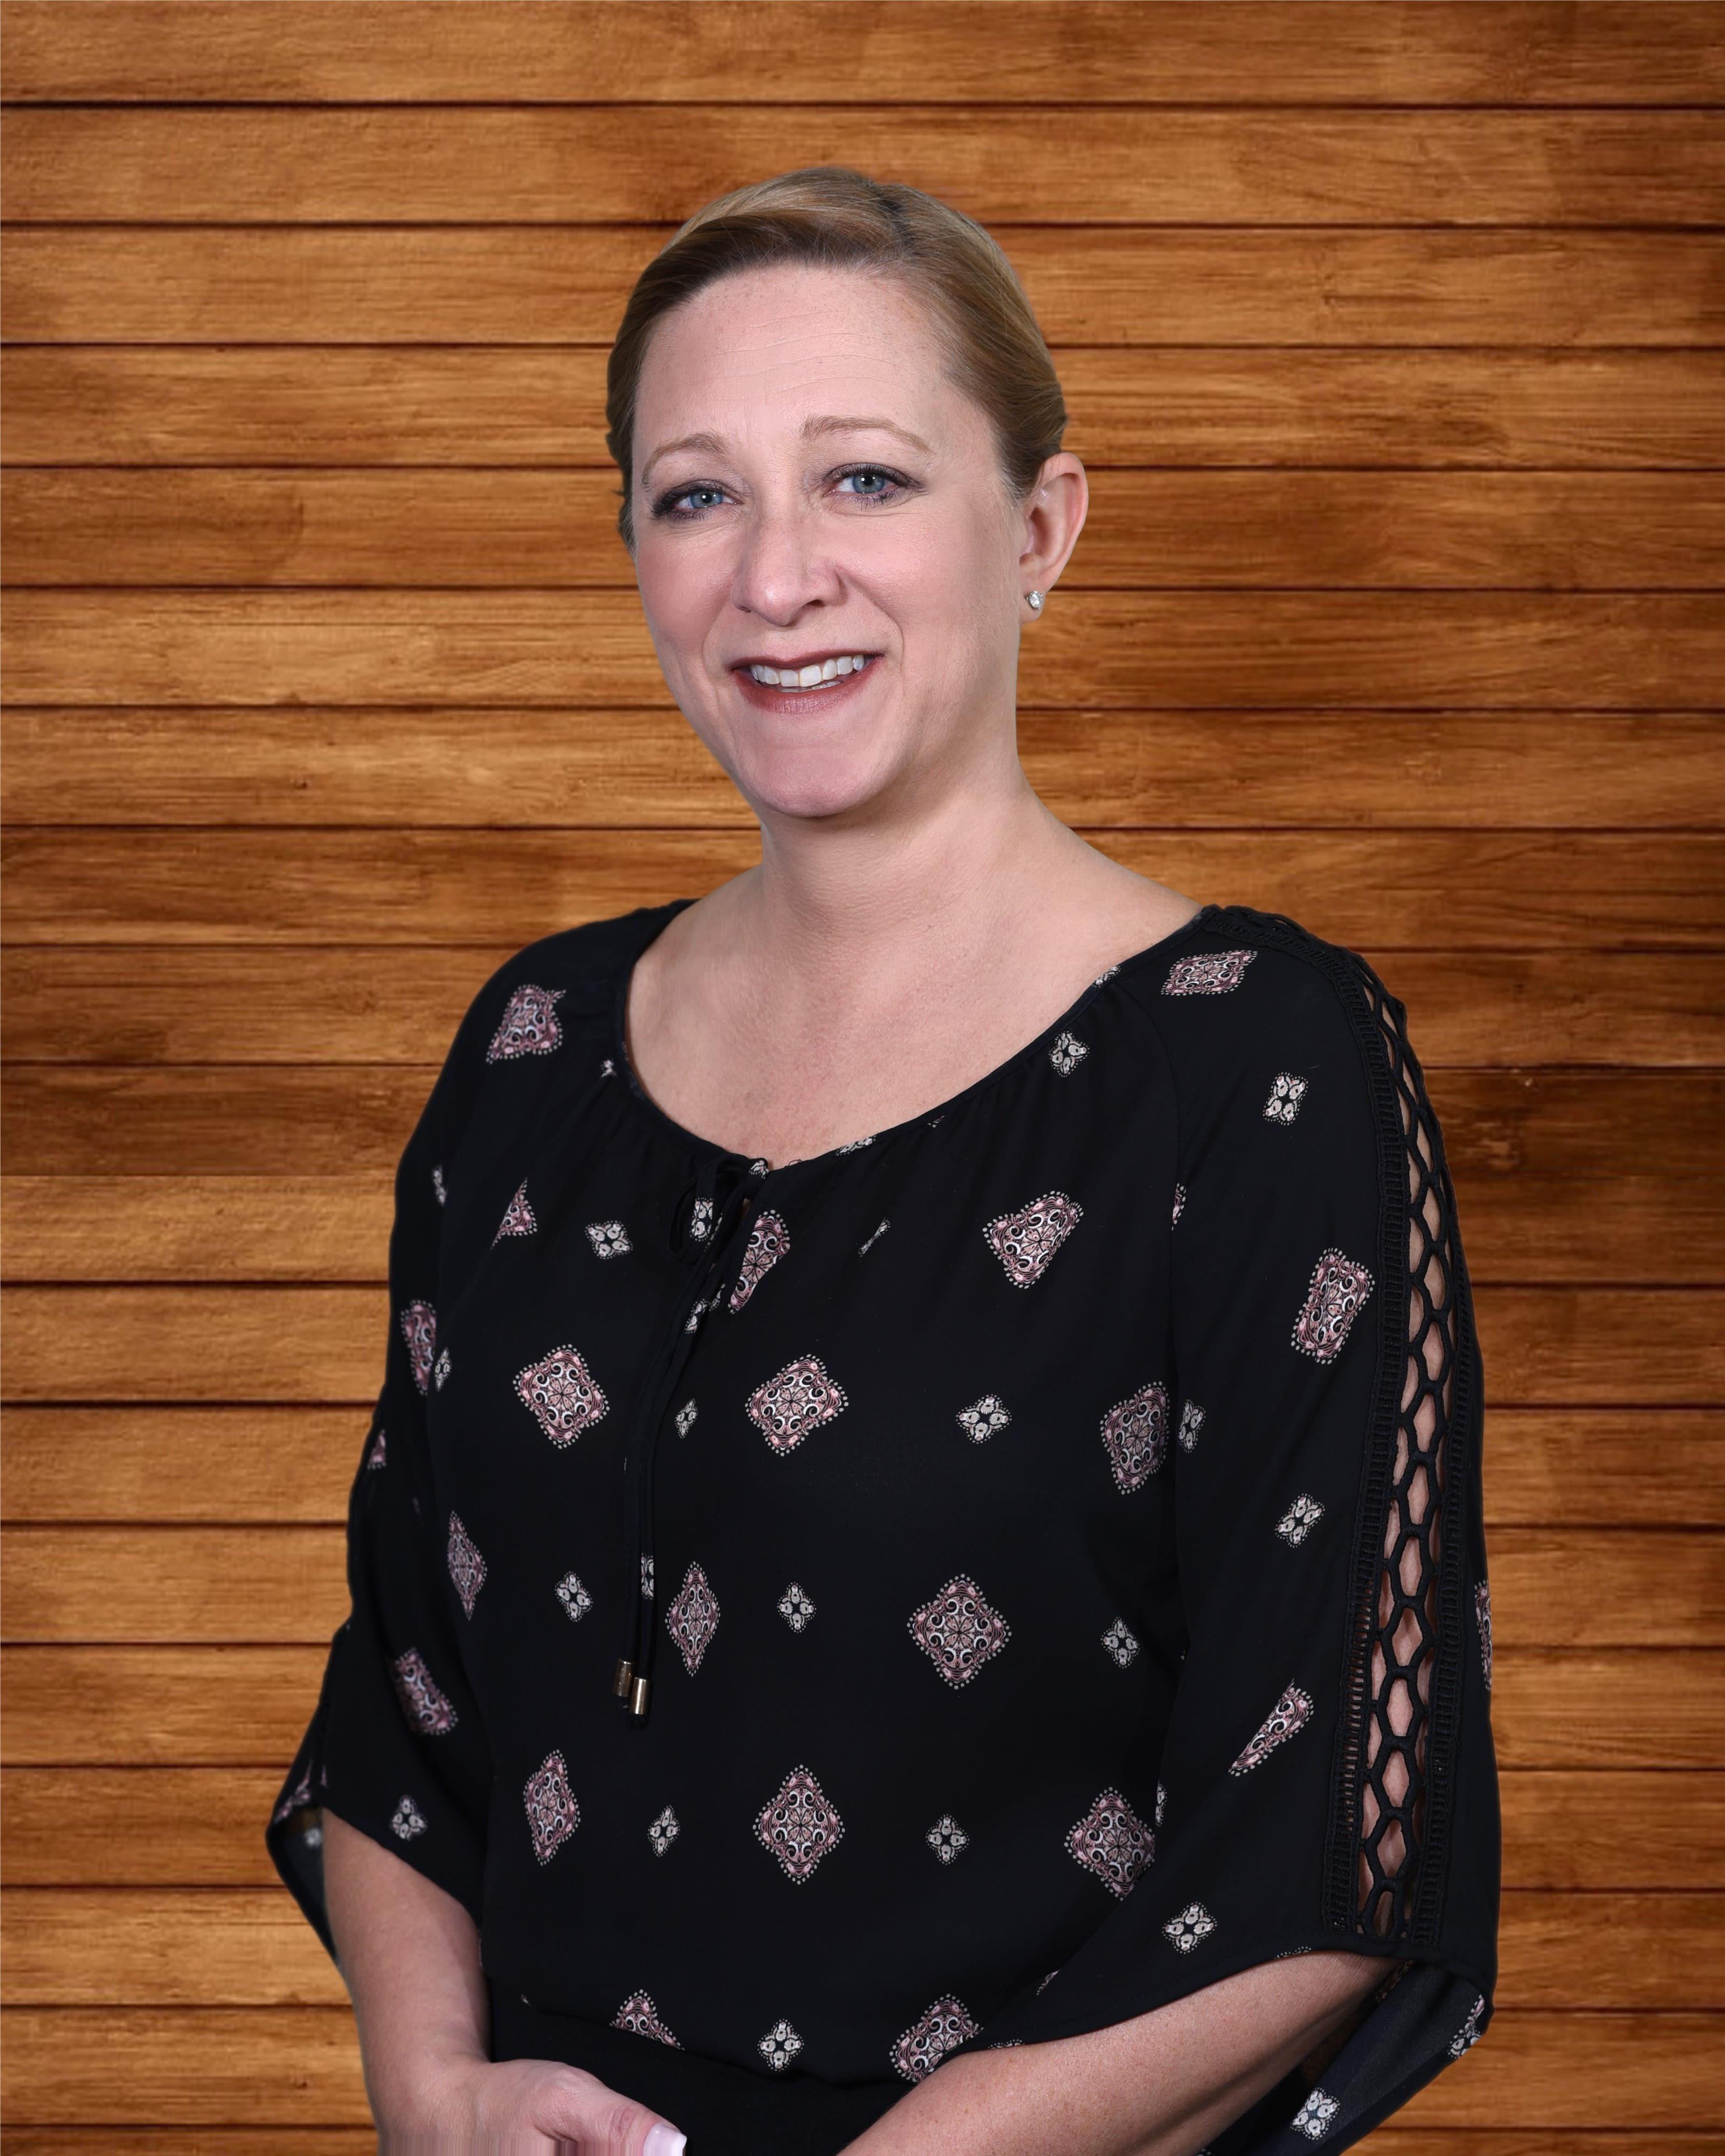 Adrienne Shraibman, General Counsel at Elegance Living, LLC